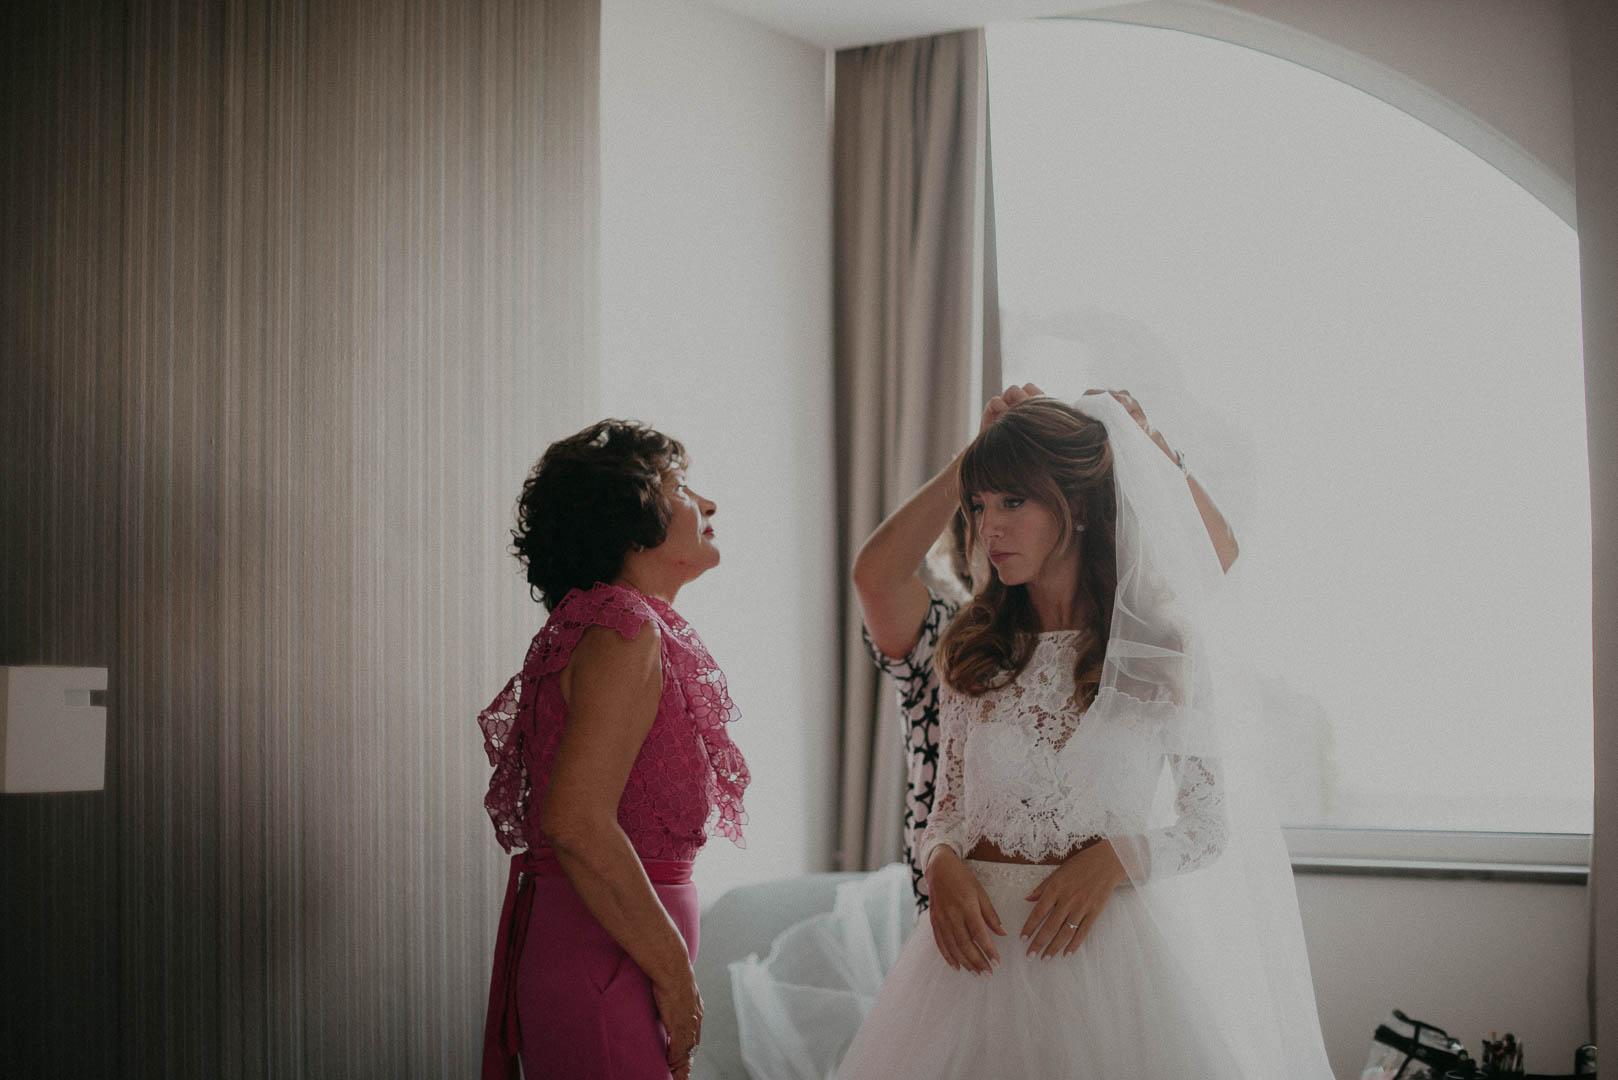 wedding-photographer-destination-fineart-bespoke-reportage-napoli-nabilah-vivianeizzo-spazio46-51